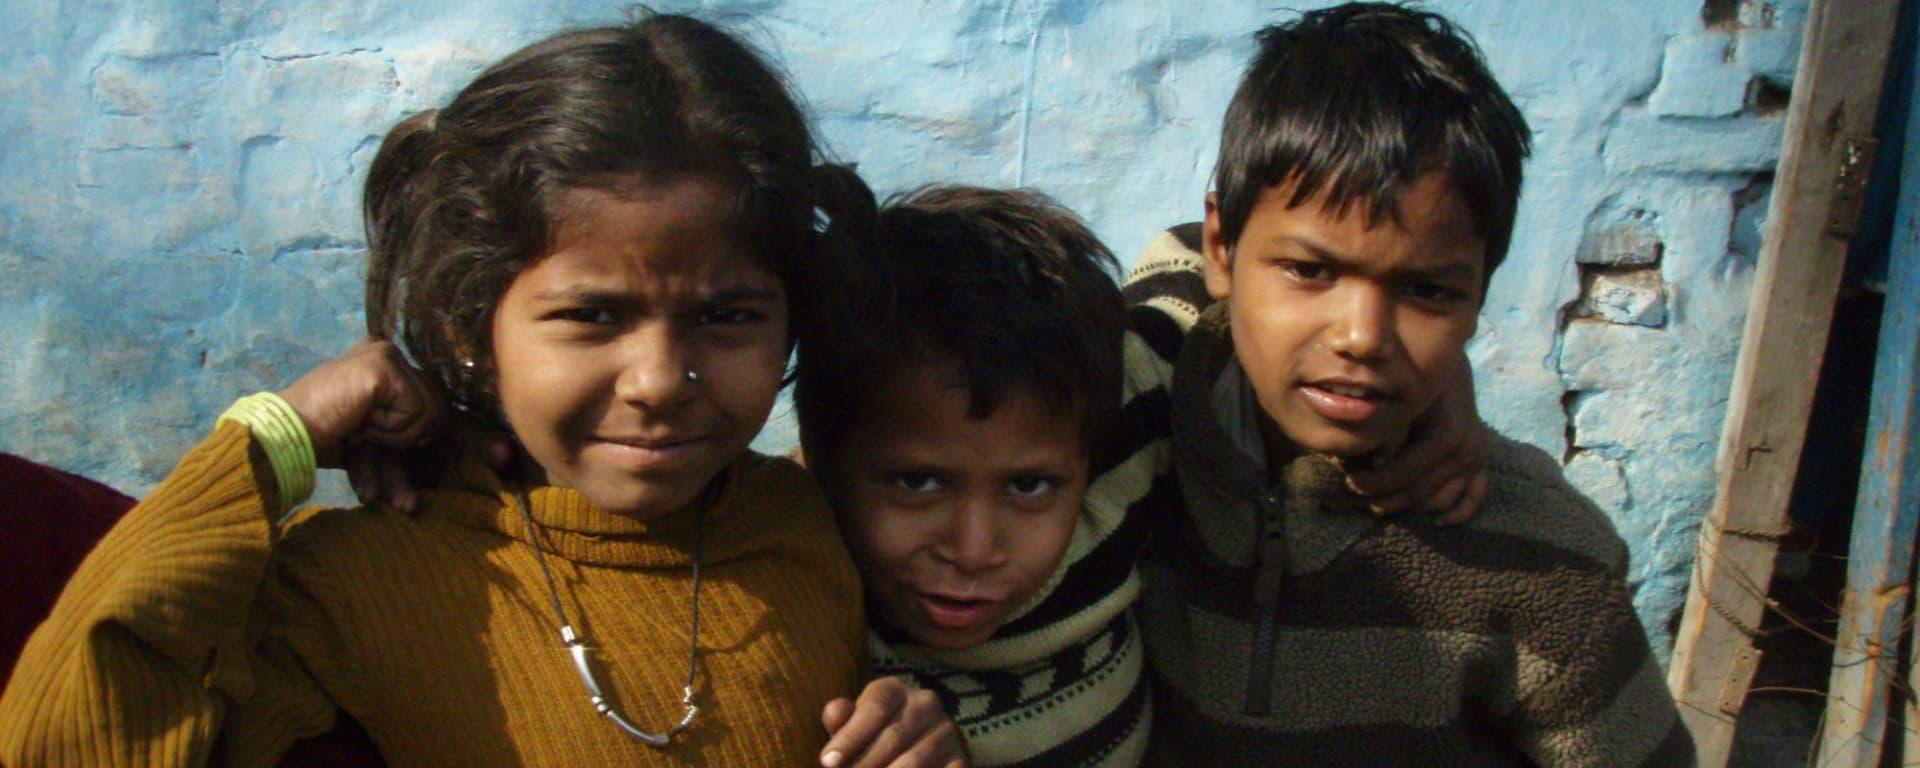 En route avec d'anciens enfants des rues à Delhi: Salaam Baalak1